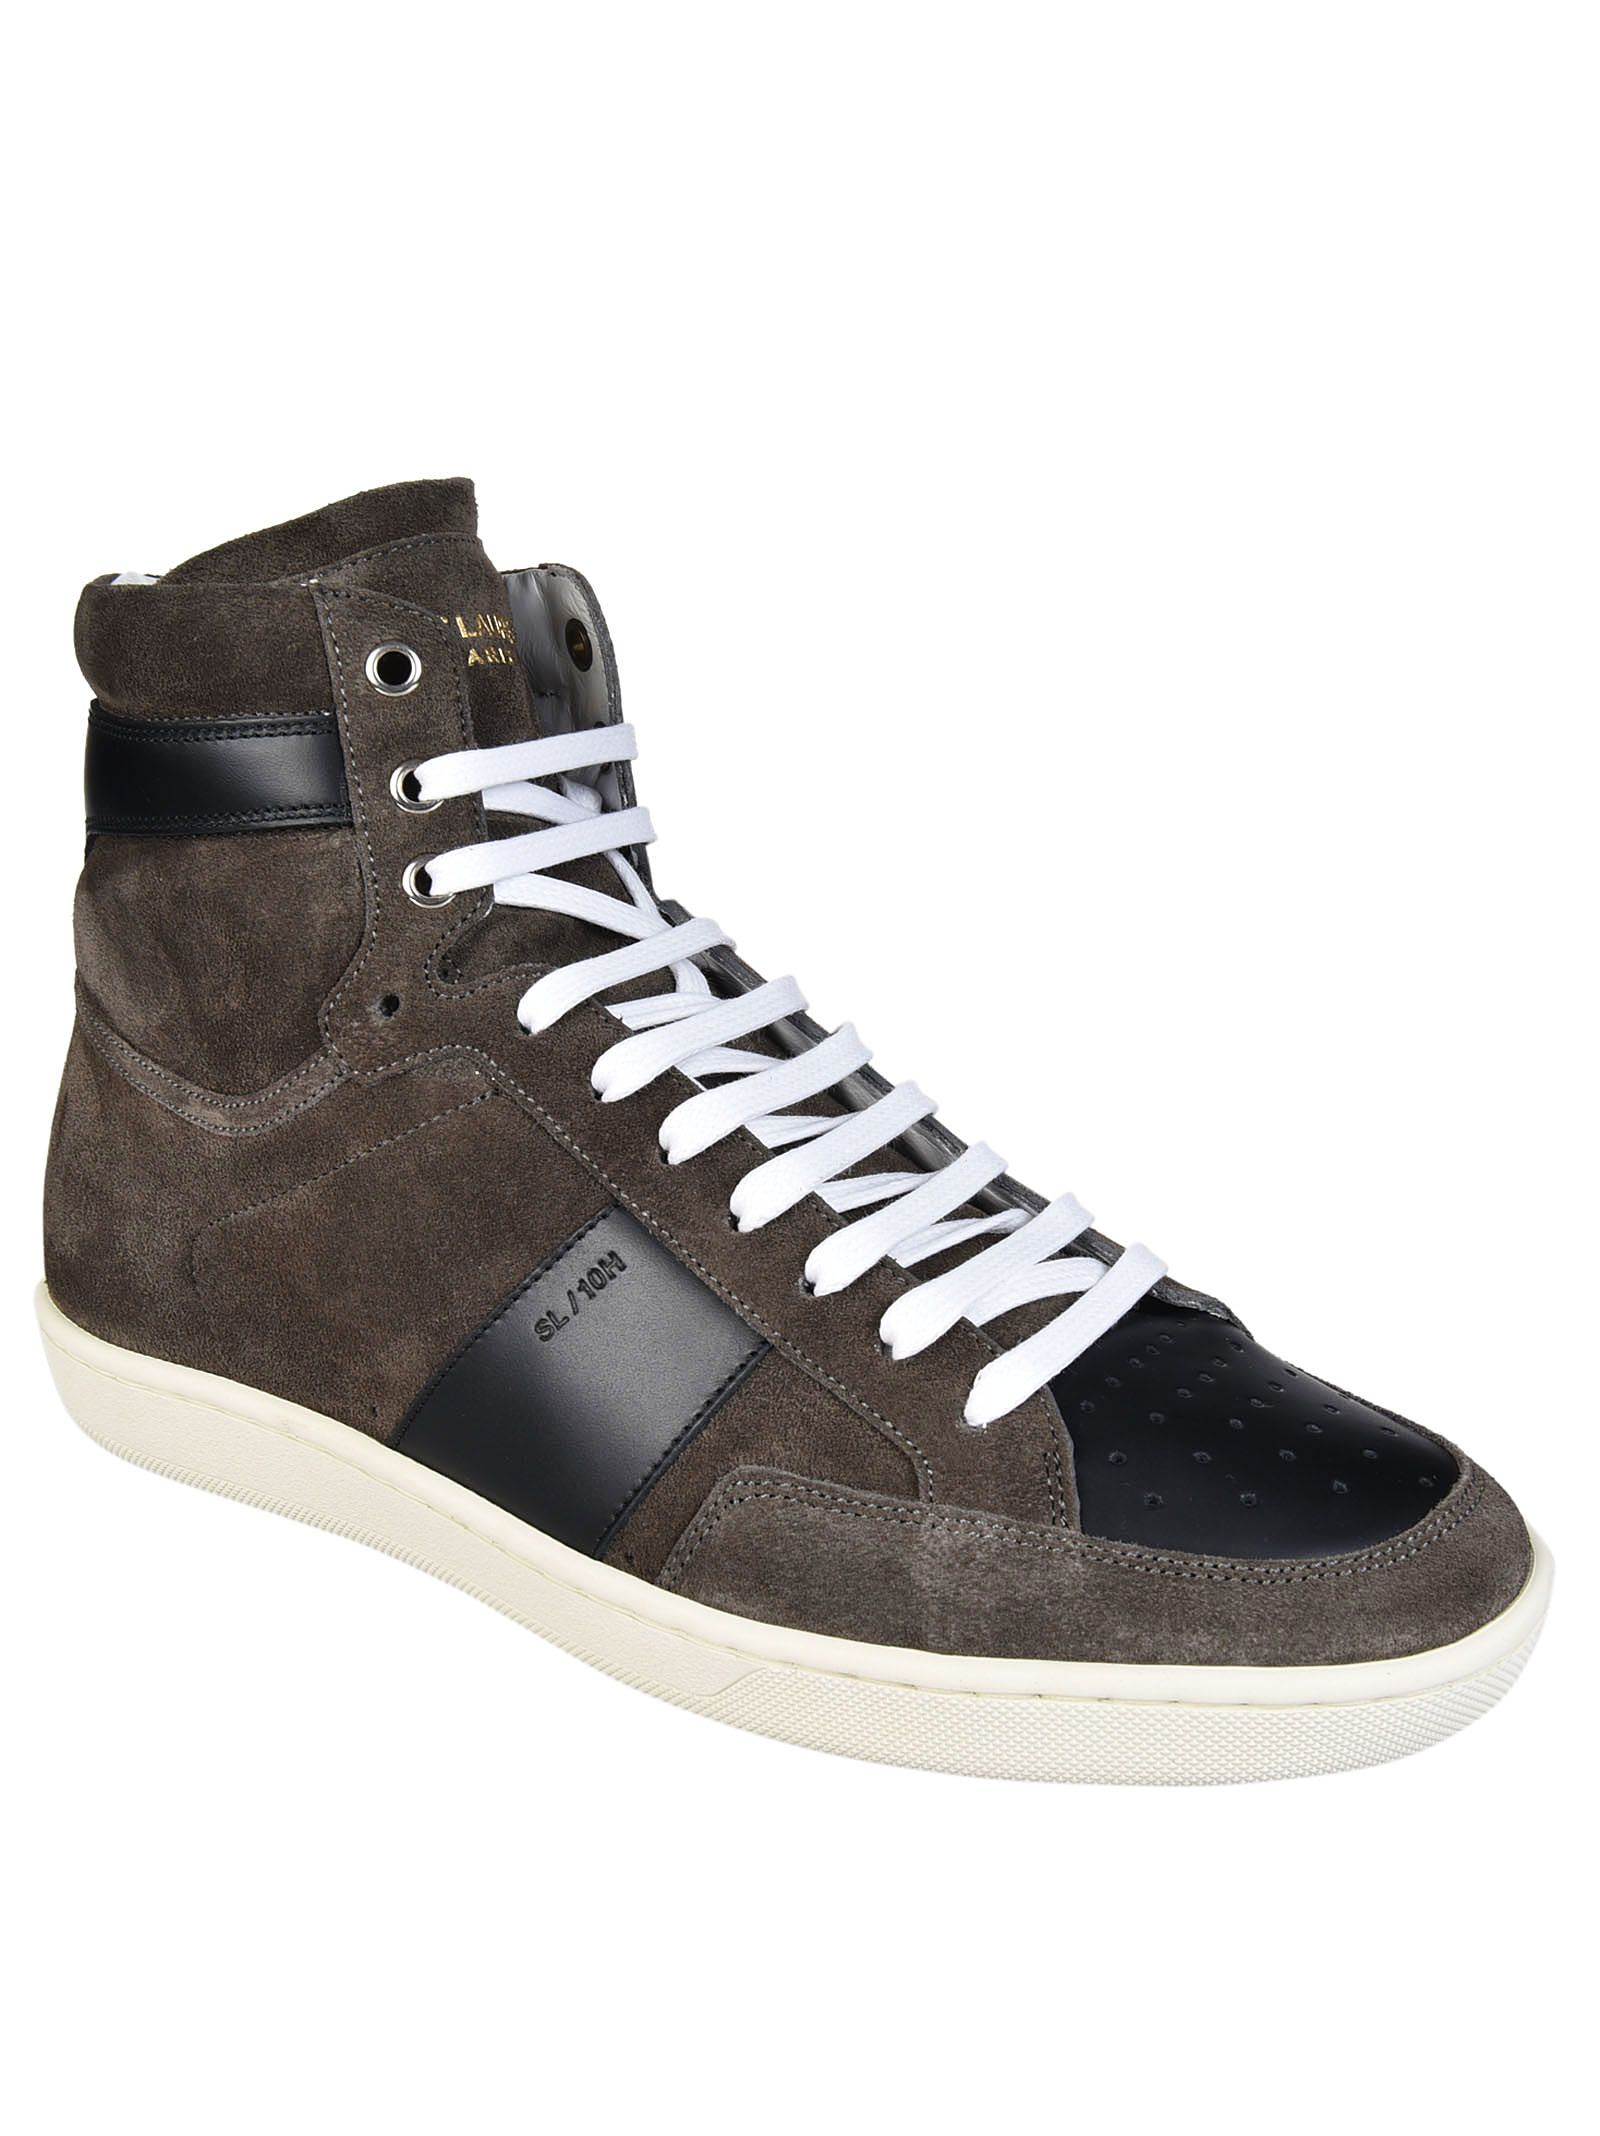 Saint Laurent - Saint Laurent Paris Hi-Top Sneakers - Brown, Men's Sneakers | Italist